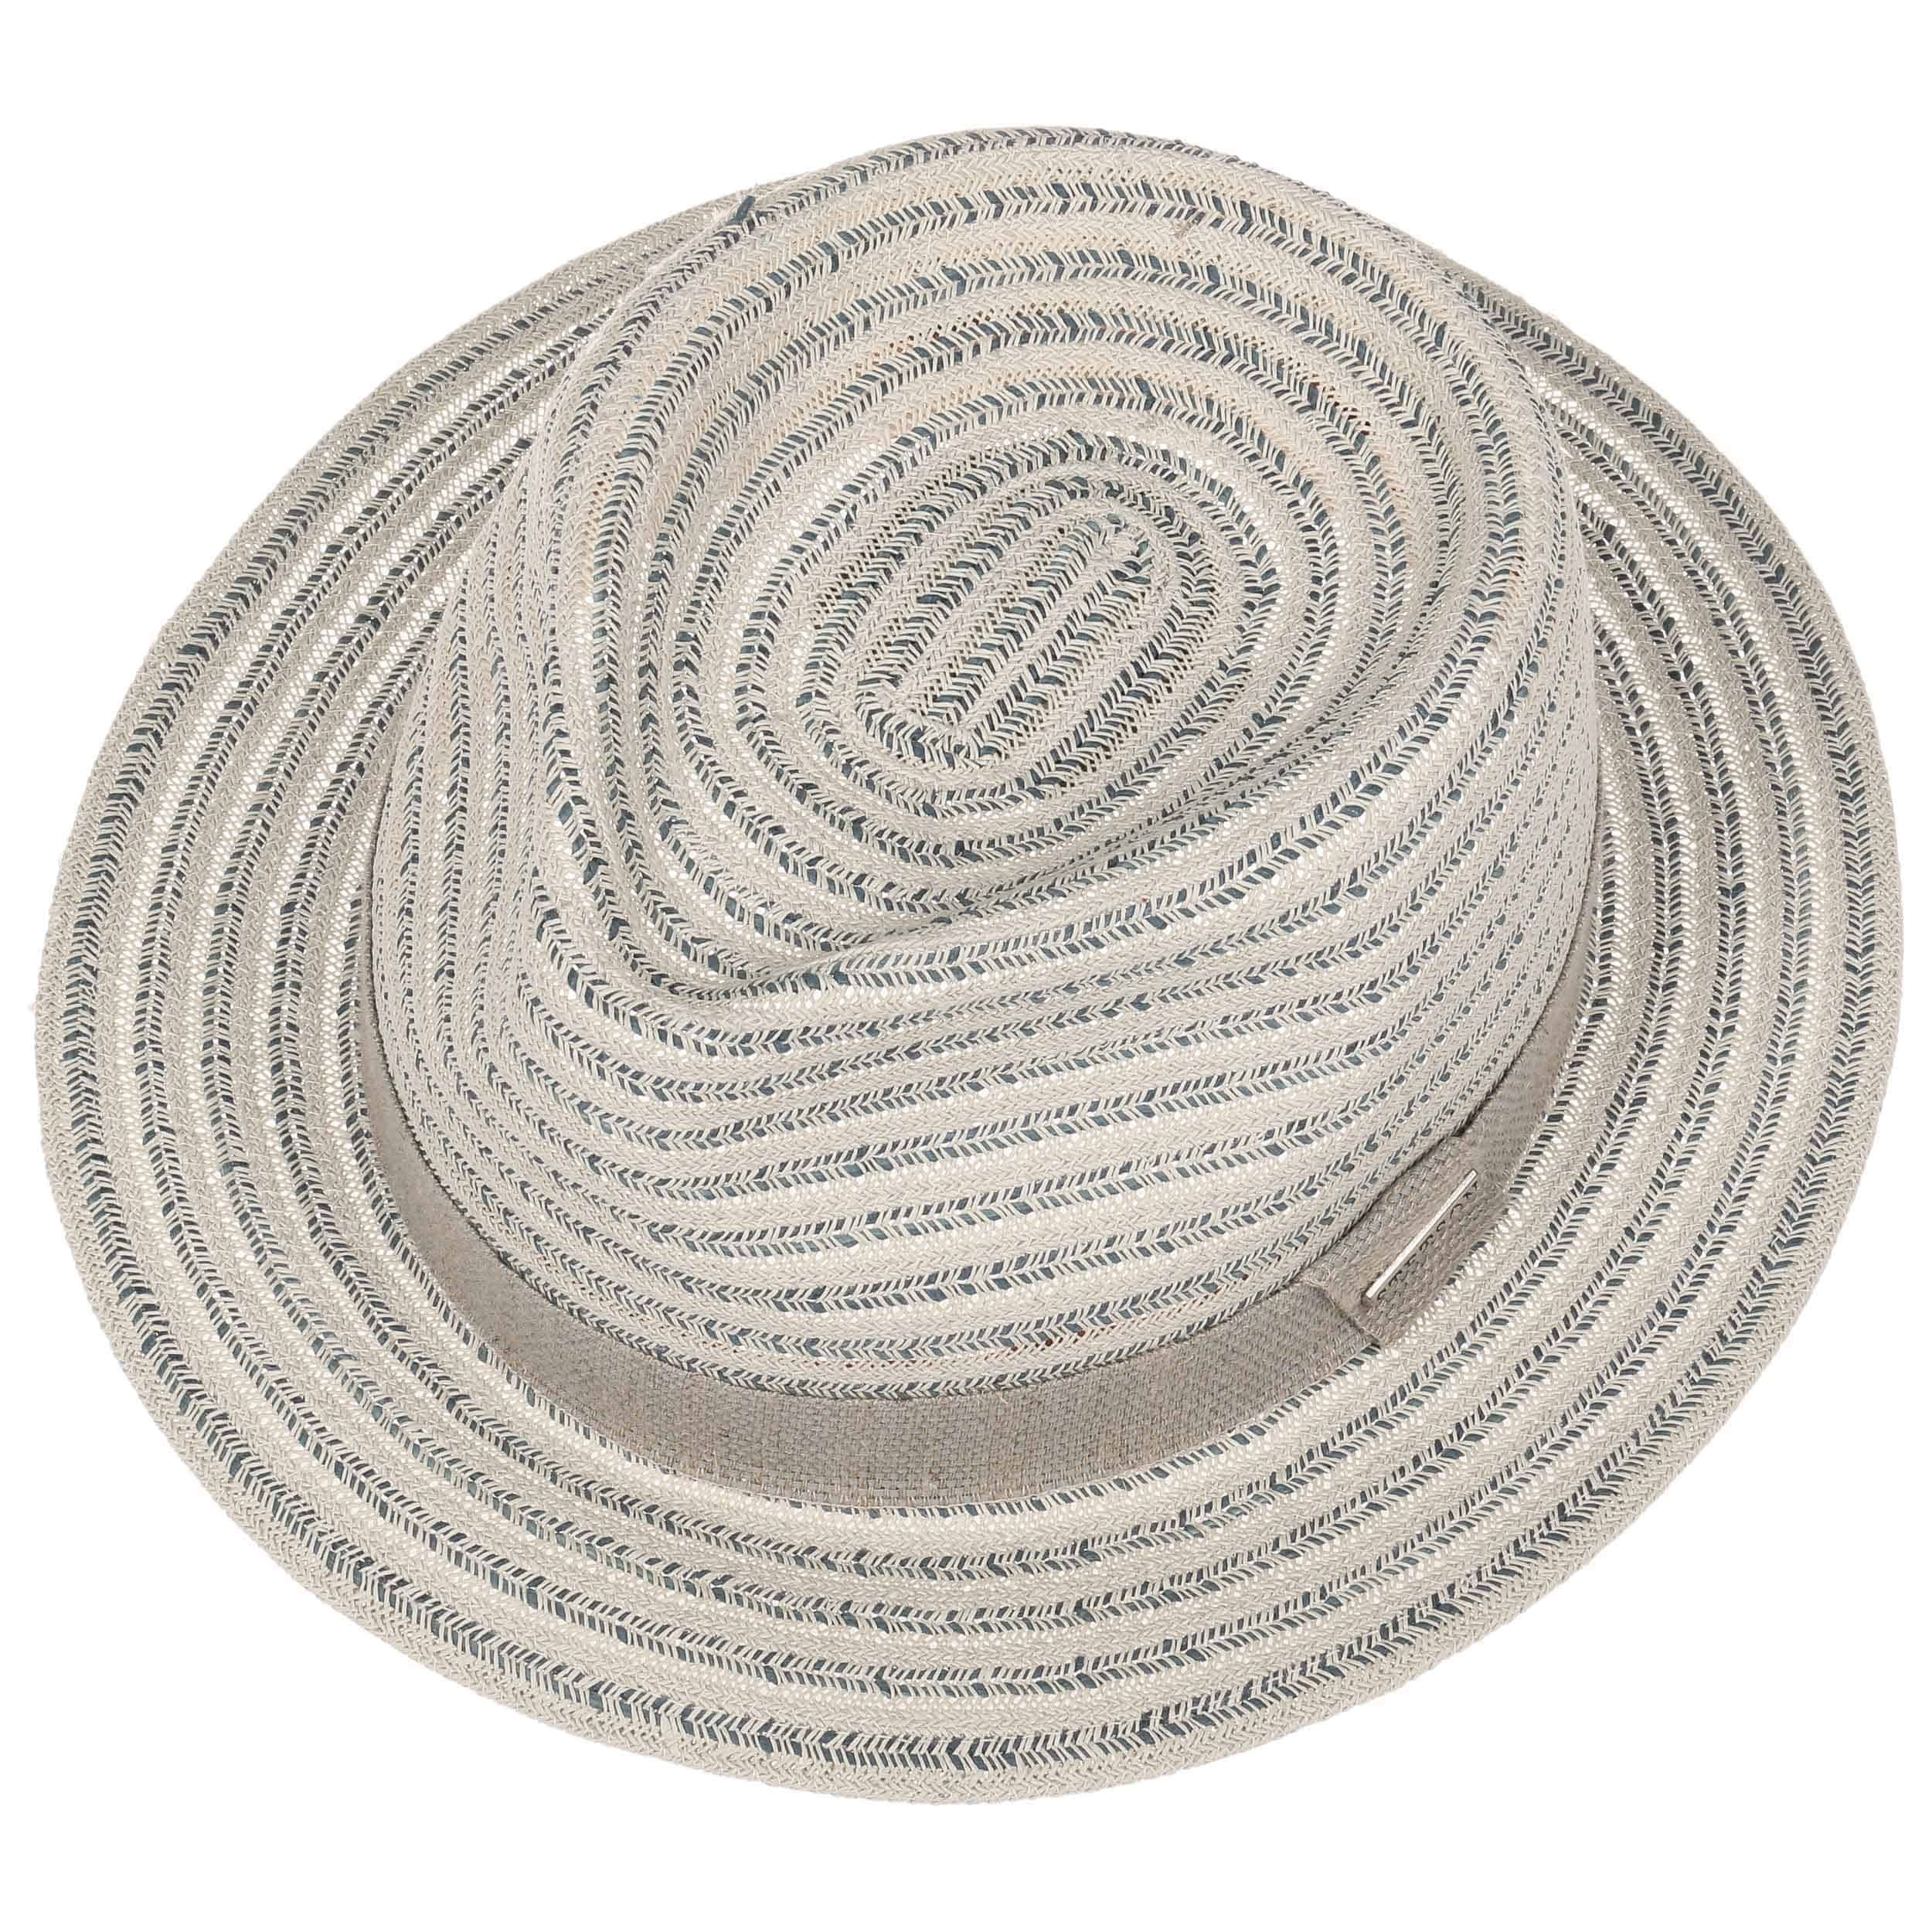 Lopez Toyo Traveller Straw Hat light grey